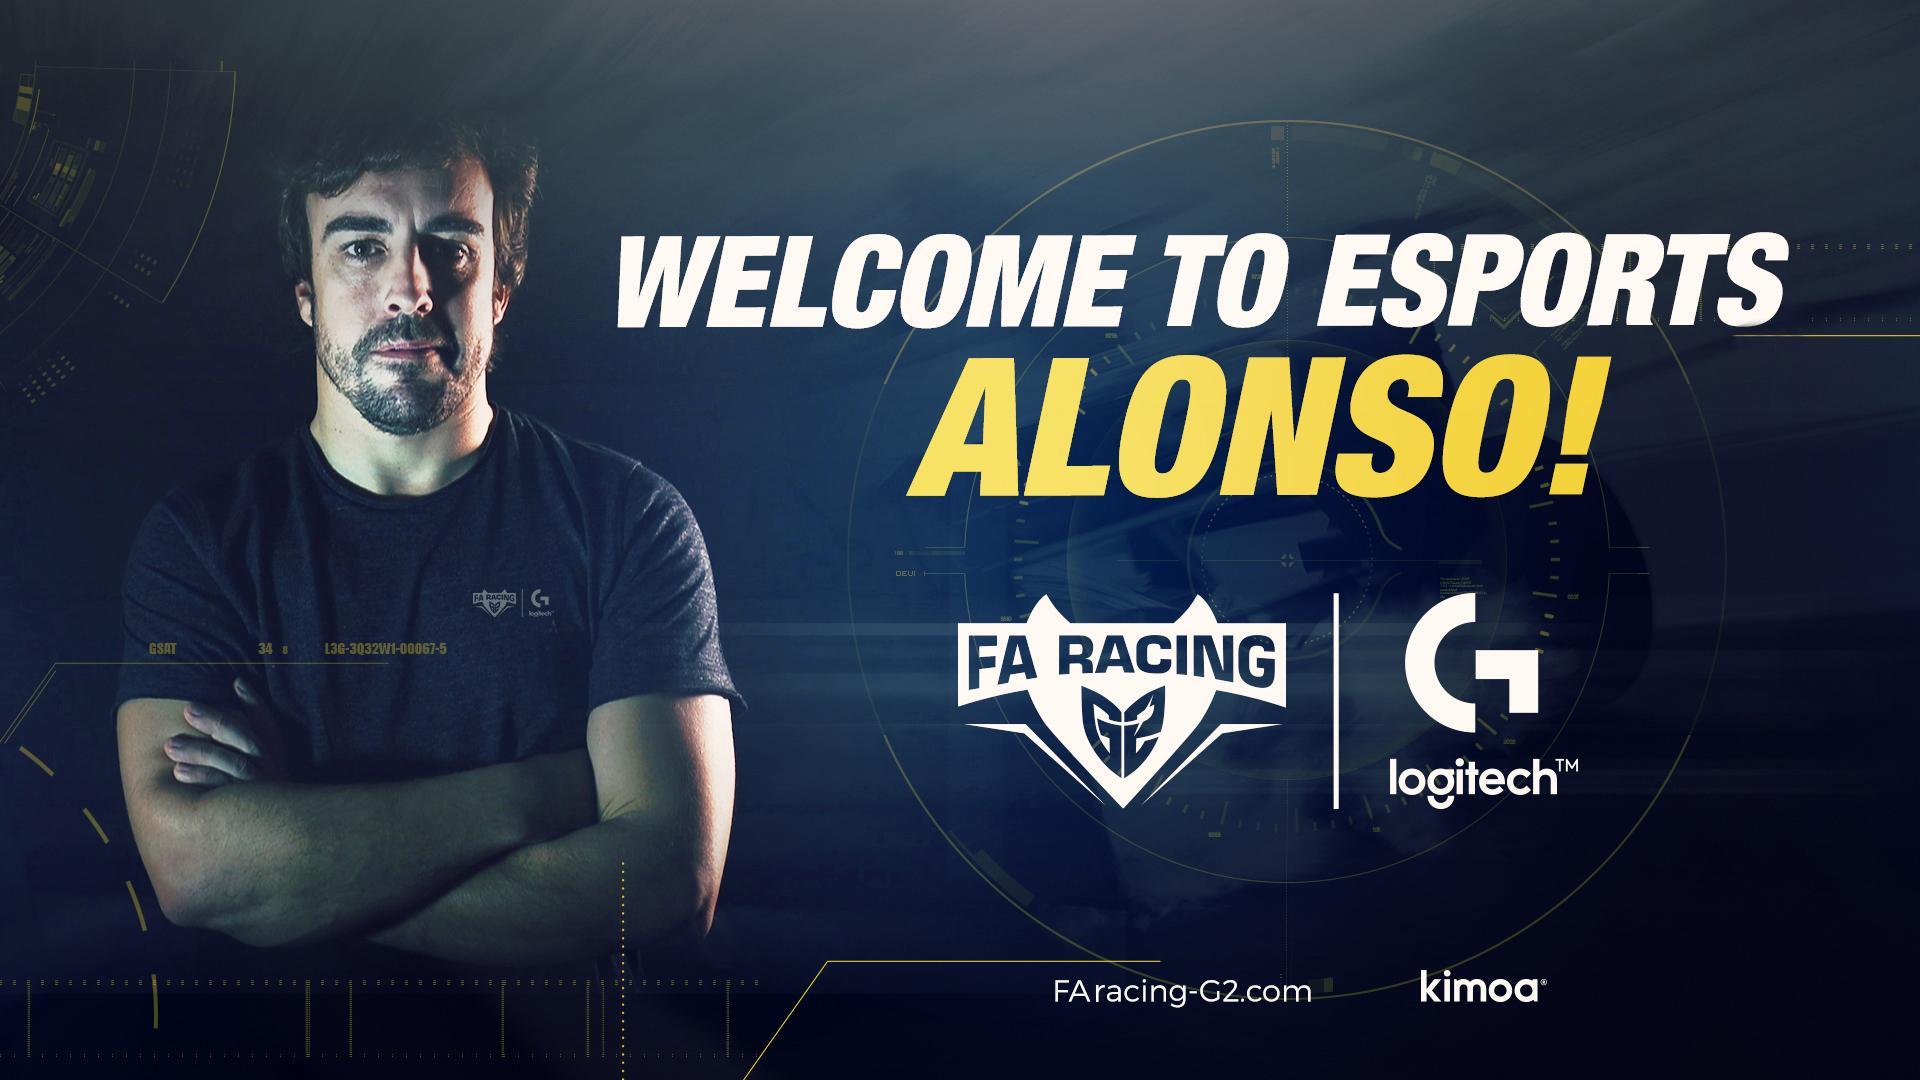 Fernando Alonso FA Racing G2 Logitech esports